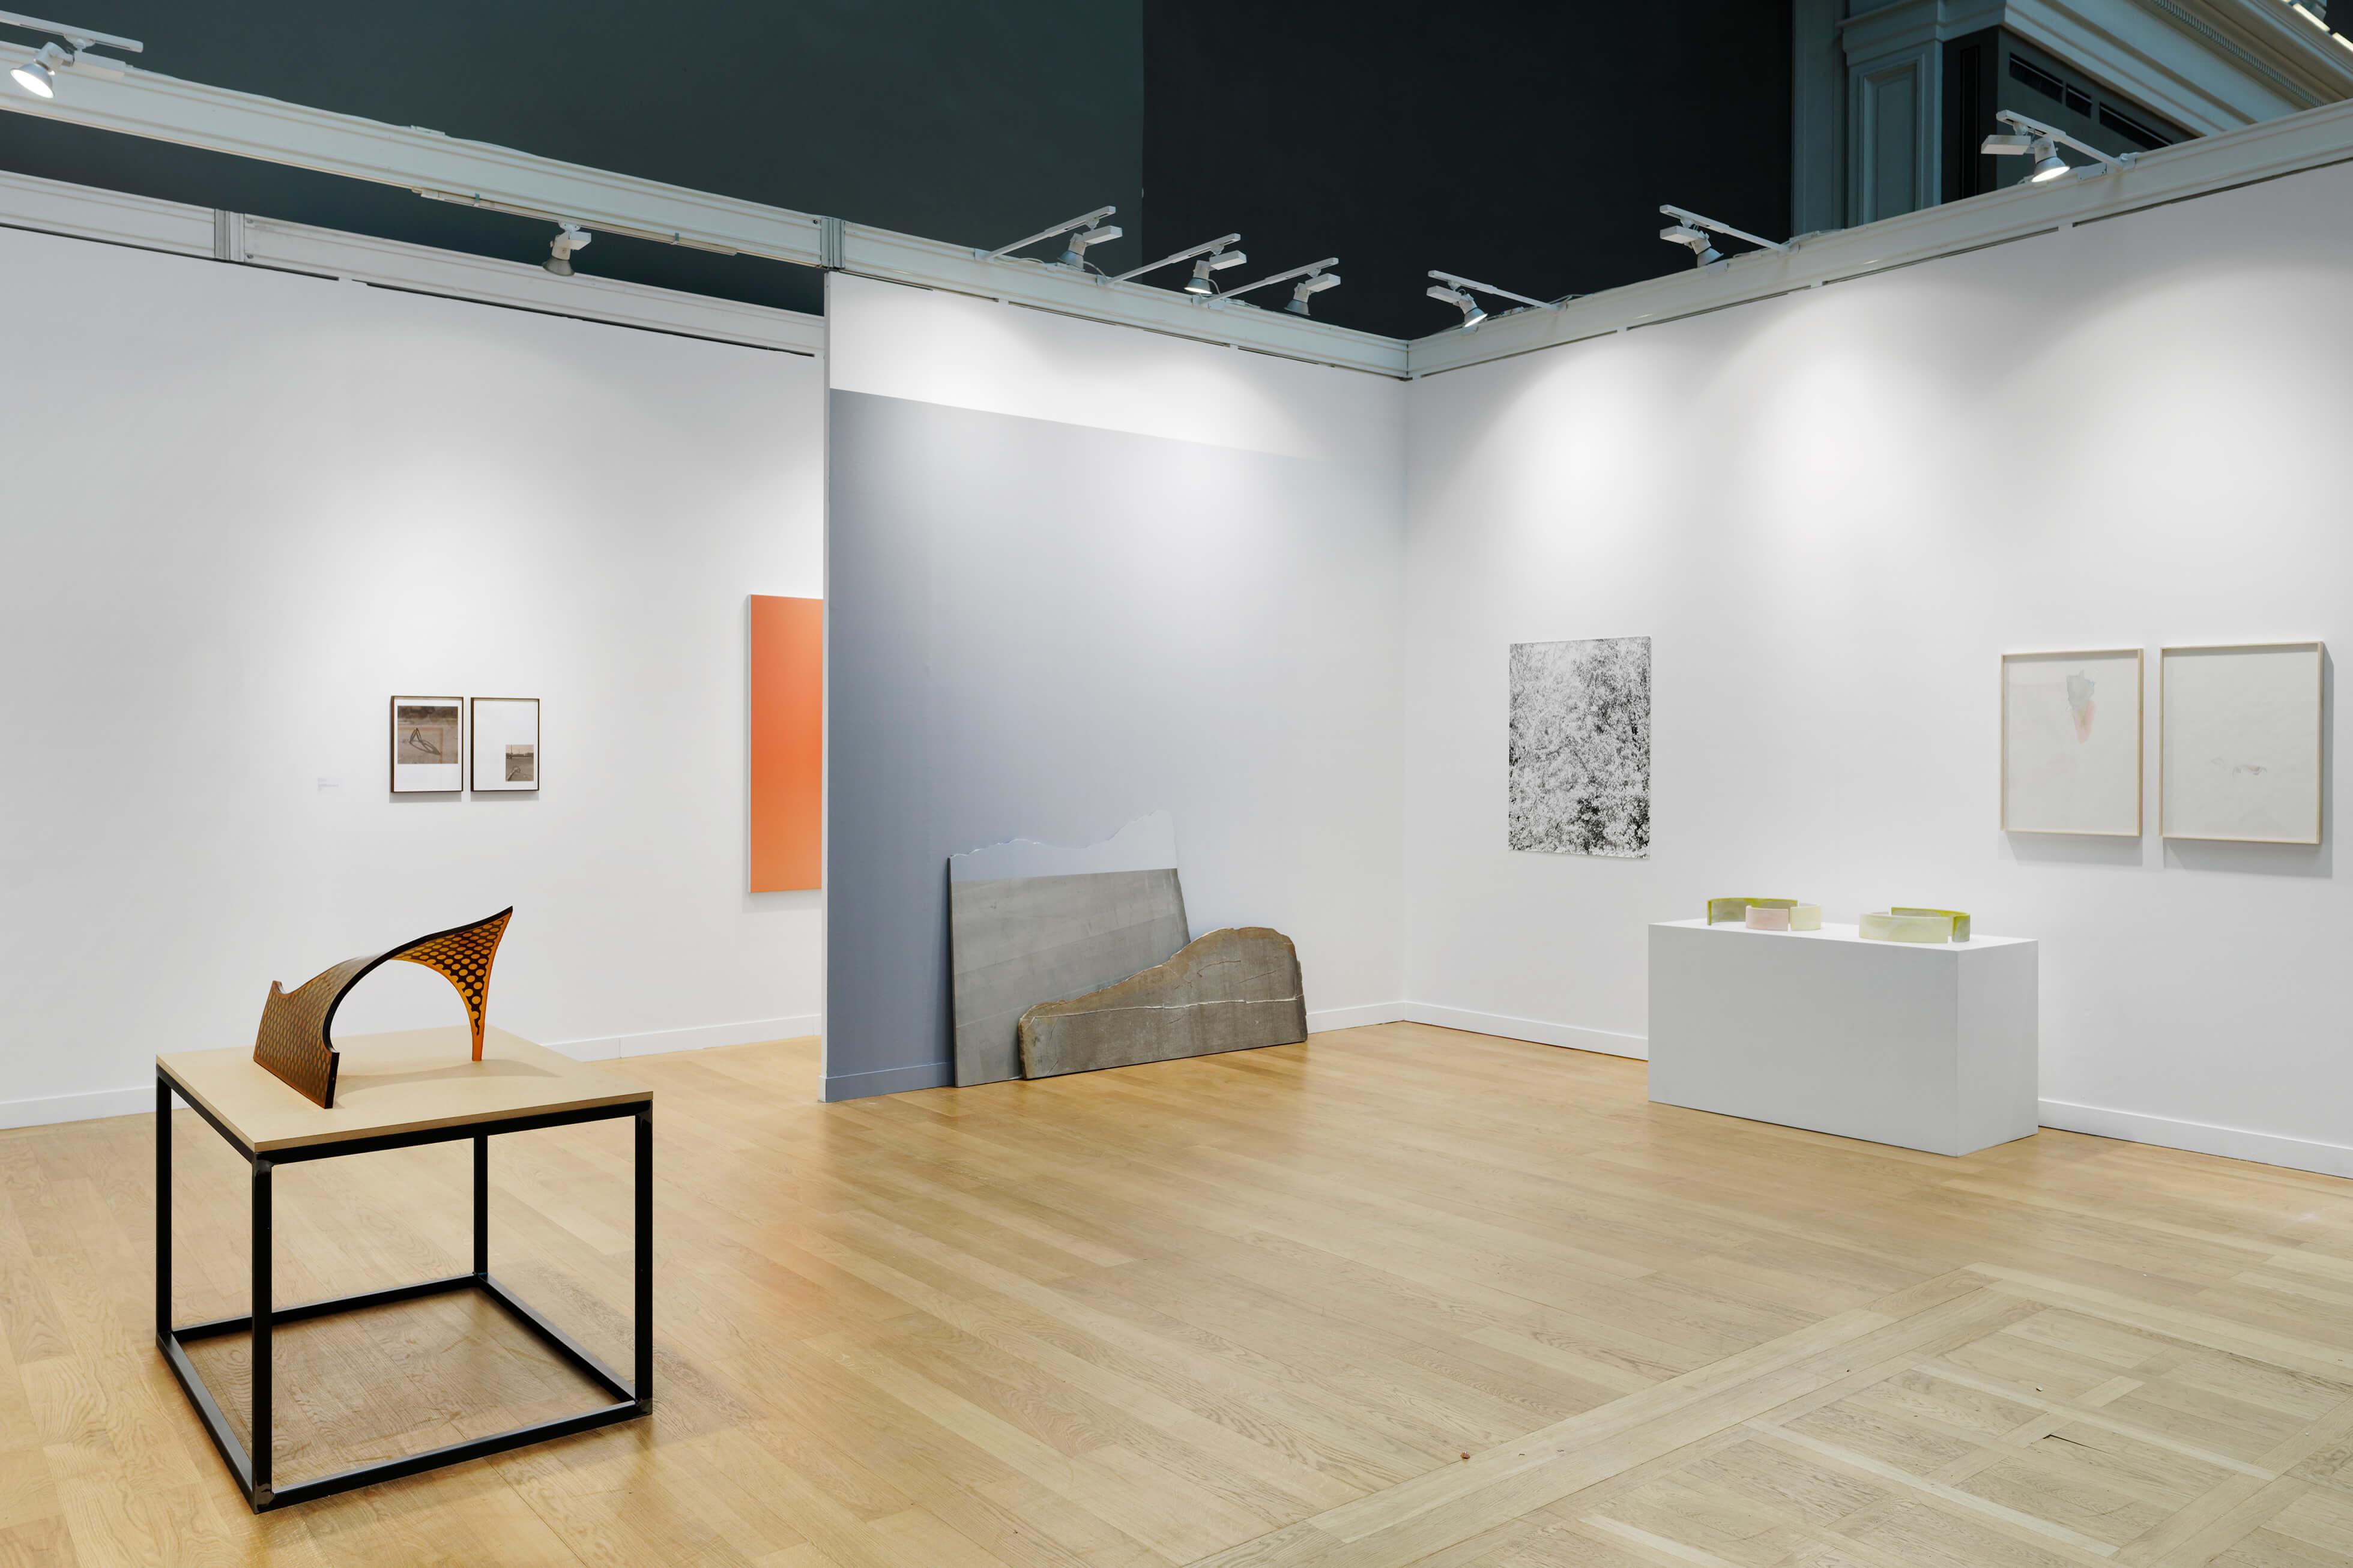 Installation view: ProjecteSD, Booth 1J08 | FIAC 2018. FOIRE INTERNATIONALE D'ART CONTEMPORAIN | ProjecteSD